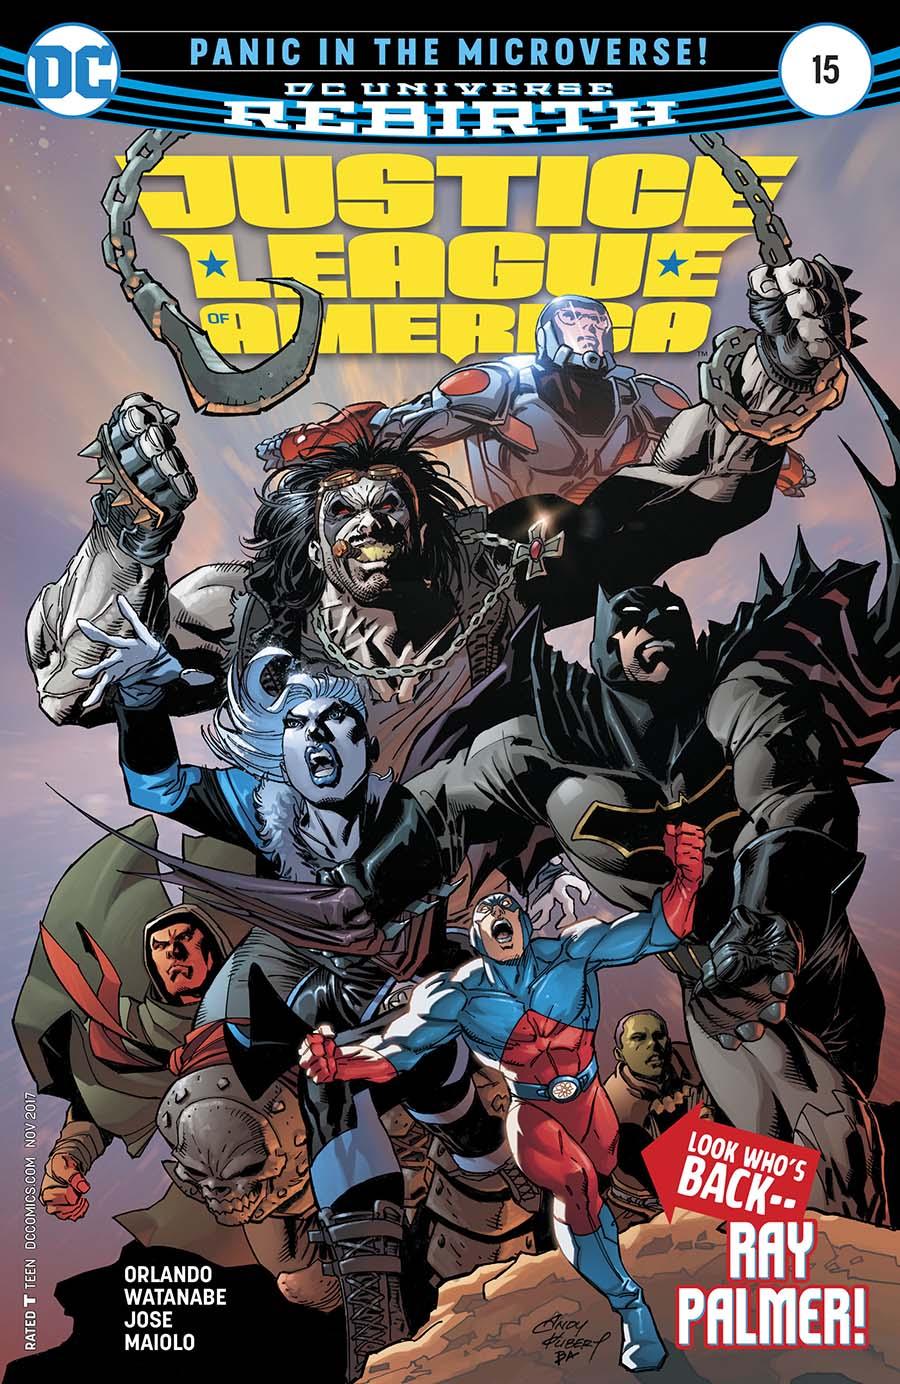 Justice League Of America Vol 5 #15 Cover A Regular Ivan Reis & Joe Prado Cover